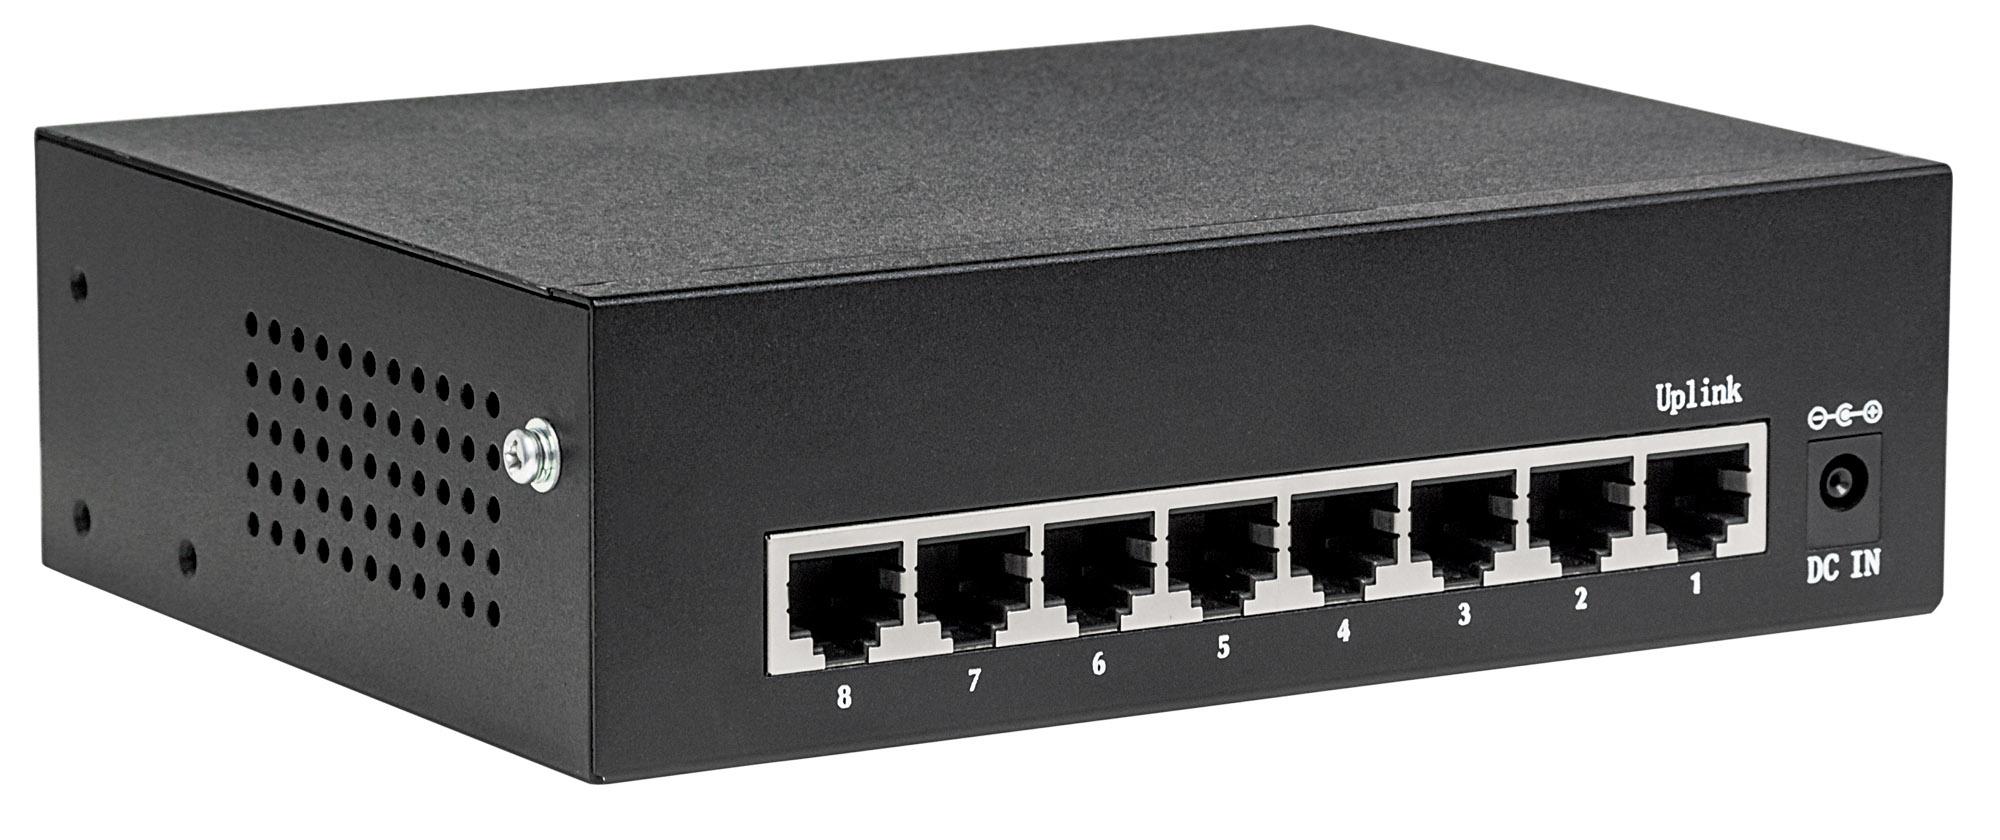 8-Port Gigabit Ethernet PoE+ Switch